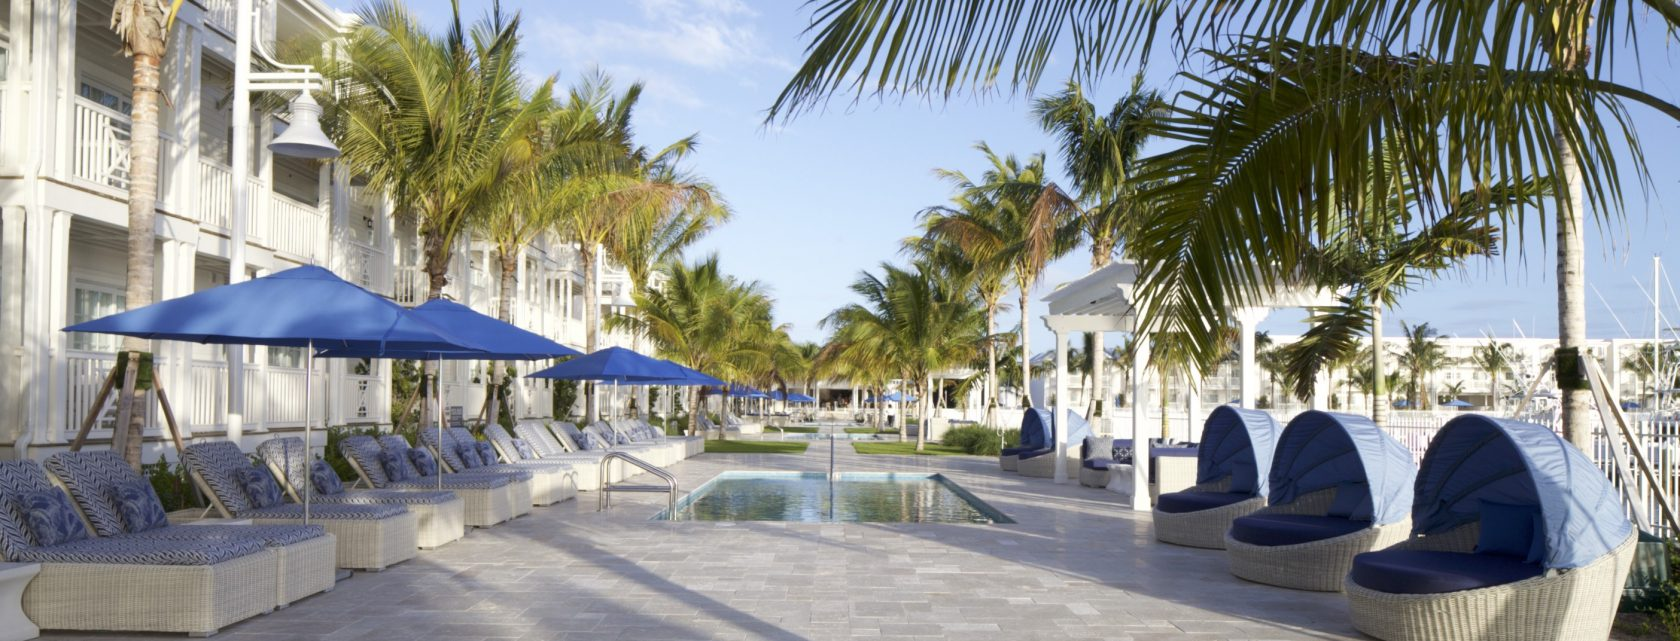 Oceans Edge Key West Resort Hotel & Marina image 1